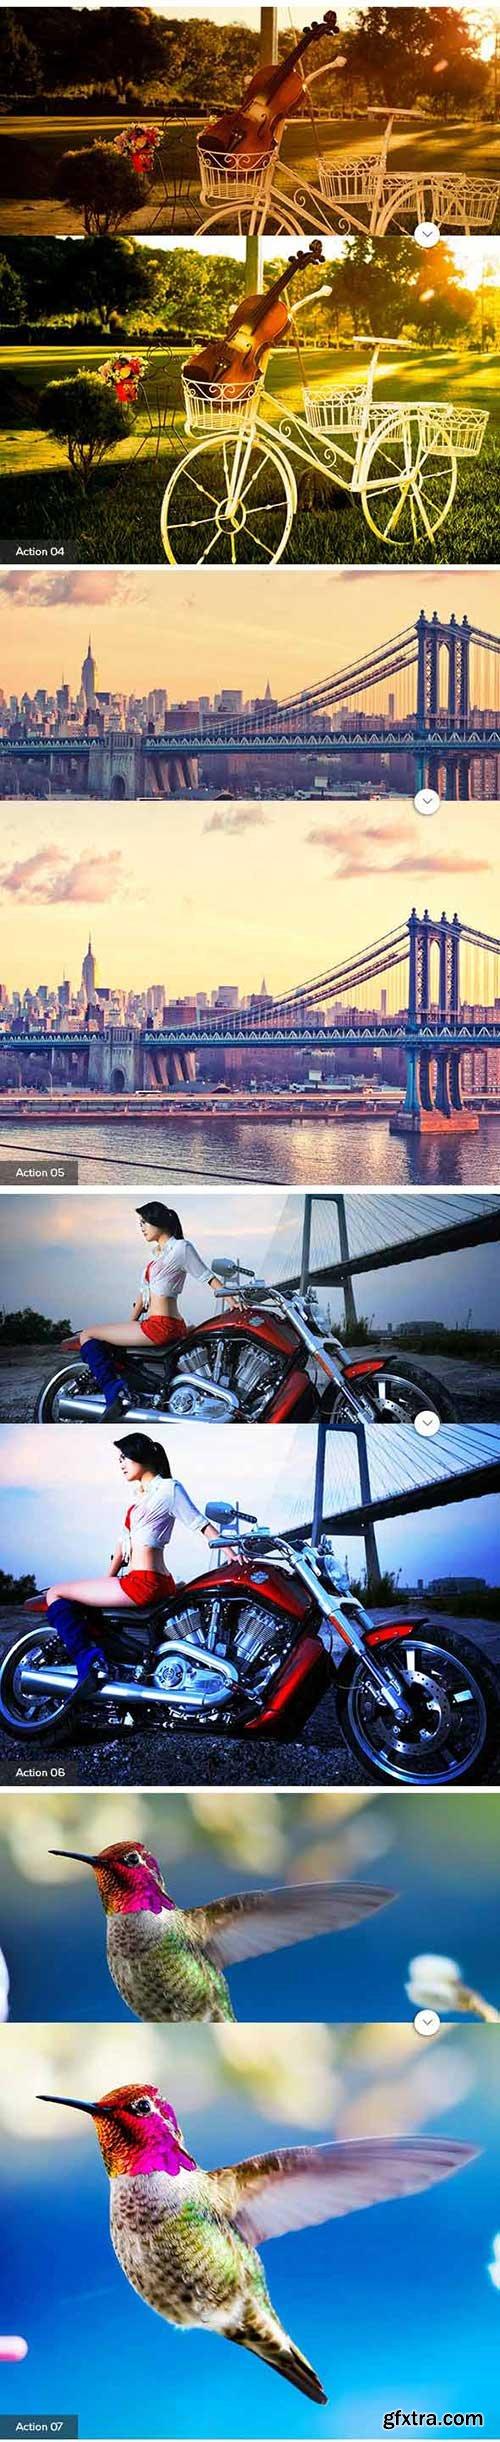 GraphicRiver - 25 Pro Photoshop Action 11364940